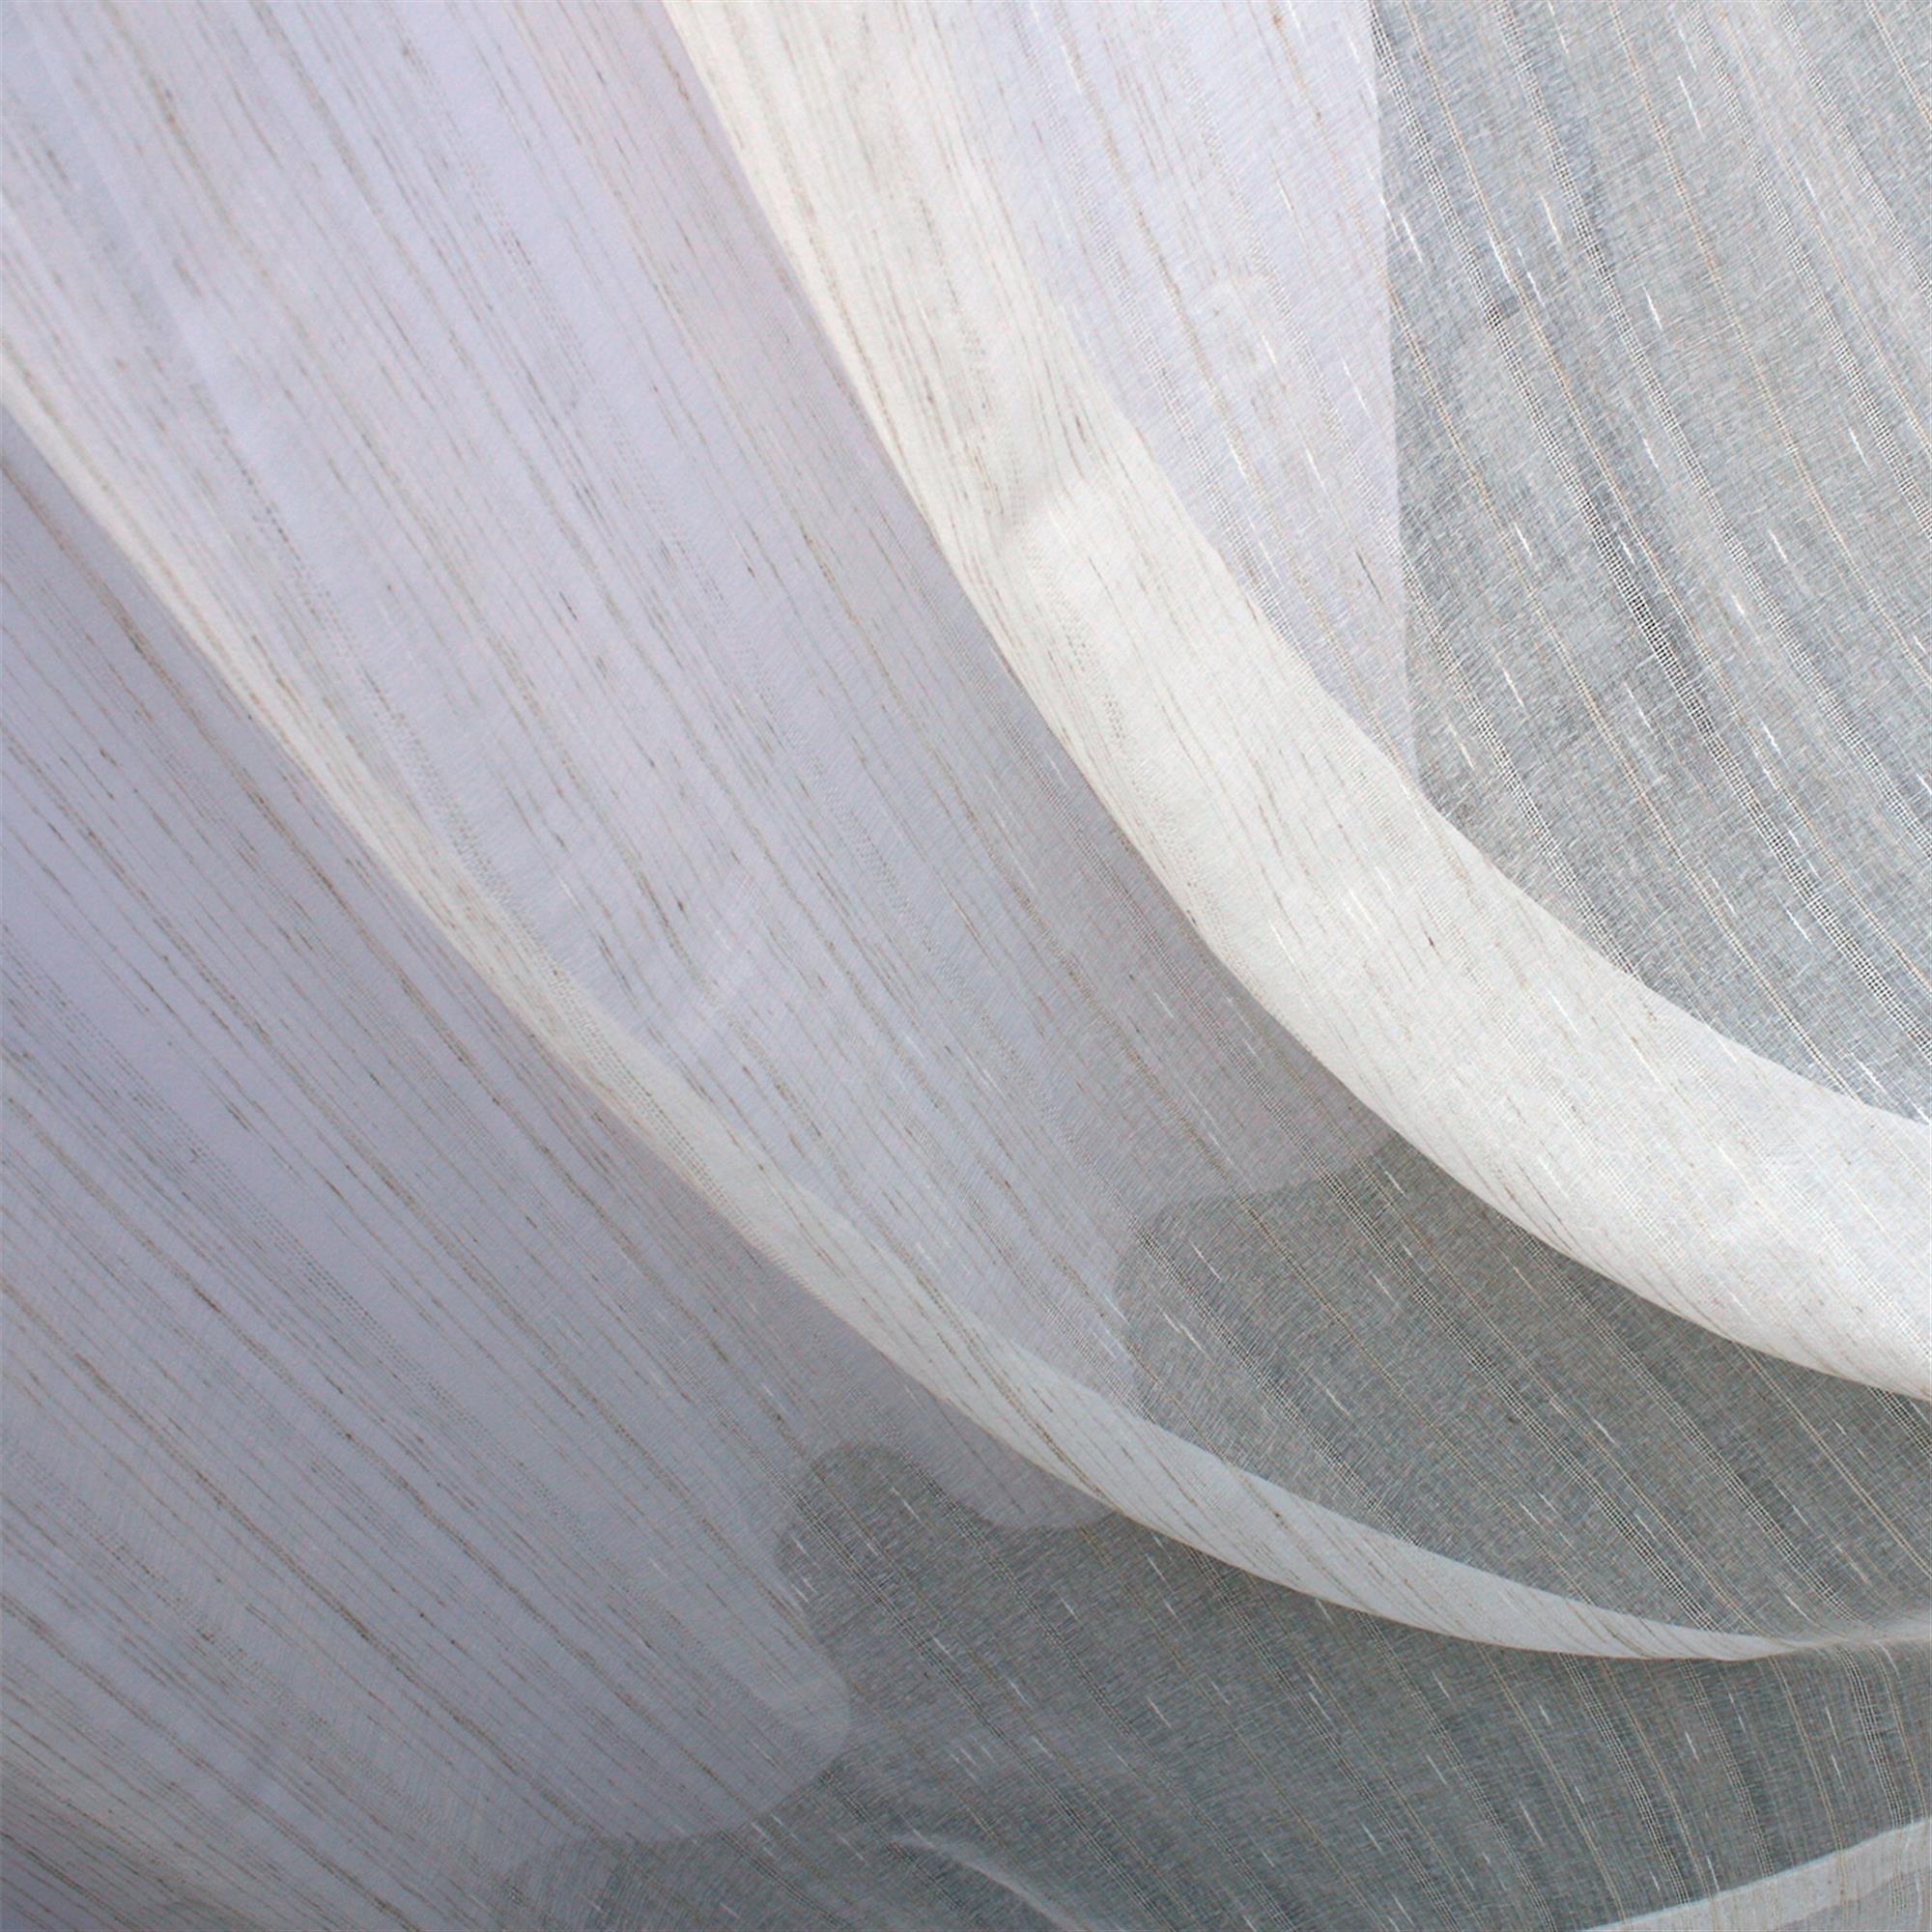 Cortina de Voil Rústico sem Forro - 8,10 x 2,84 - Para Trilho Suisso Max Simples